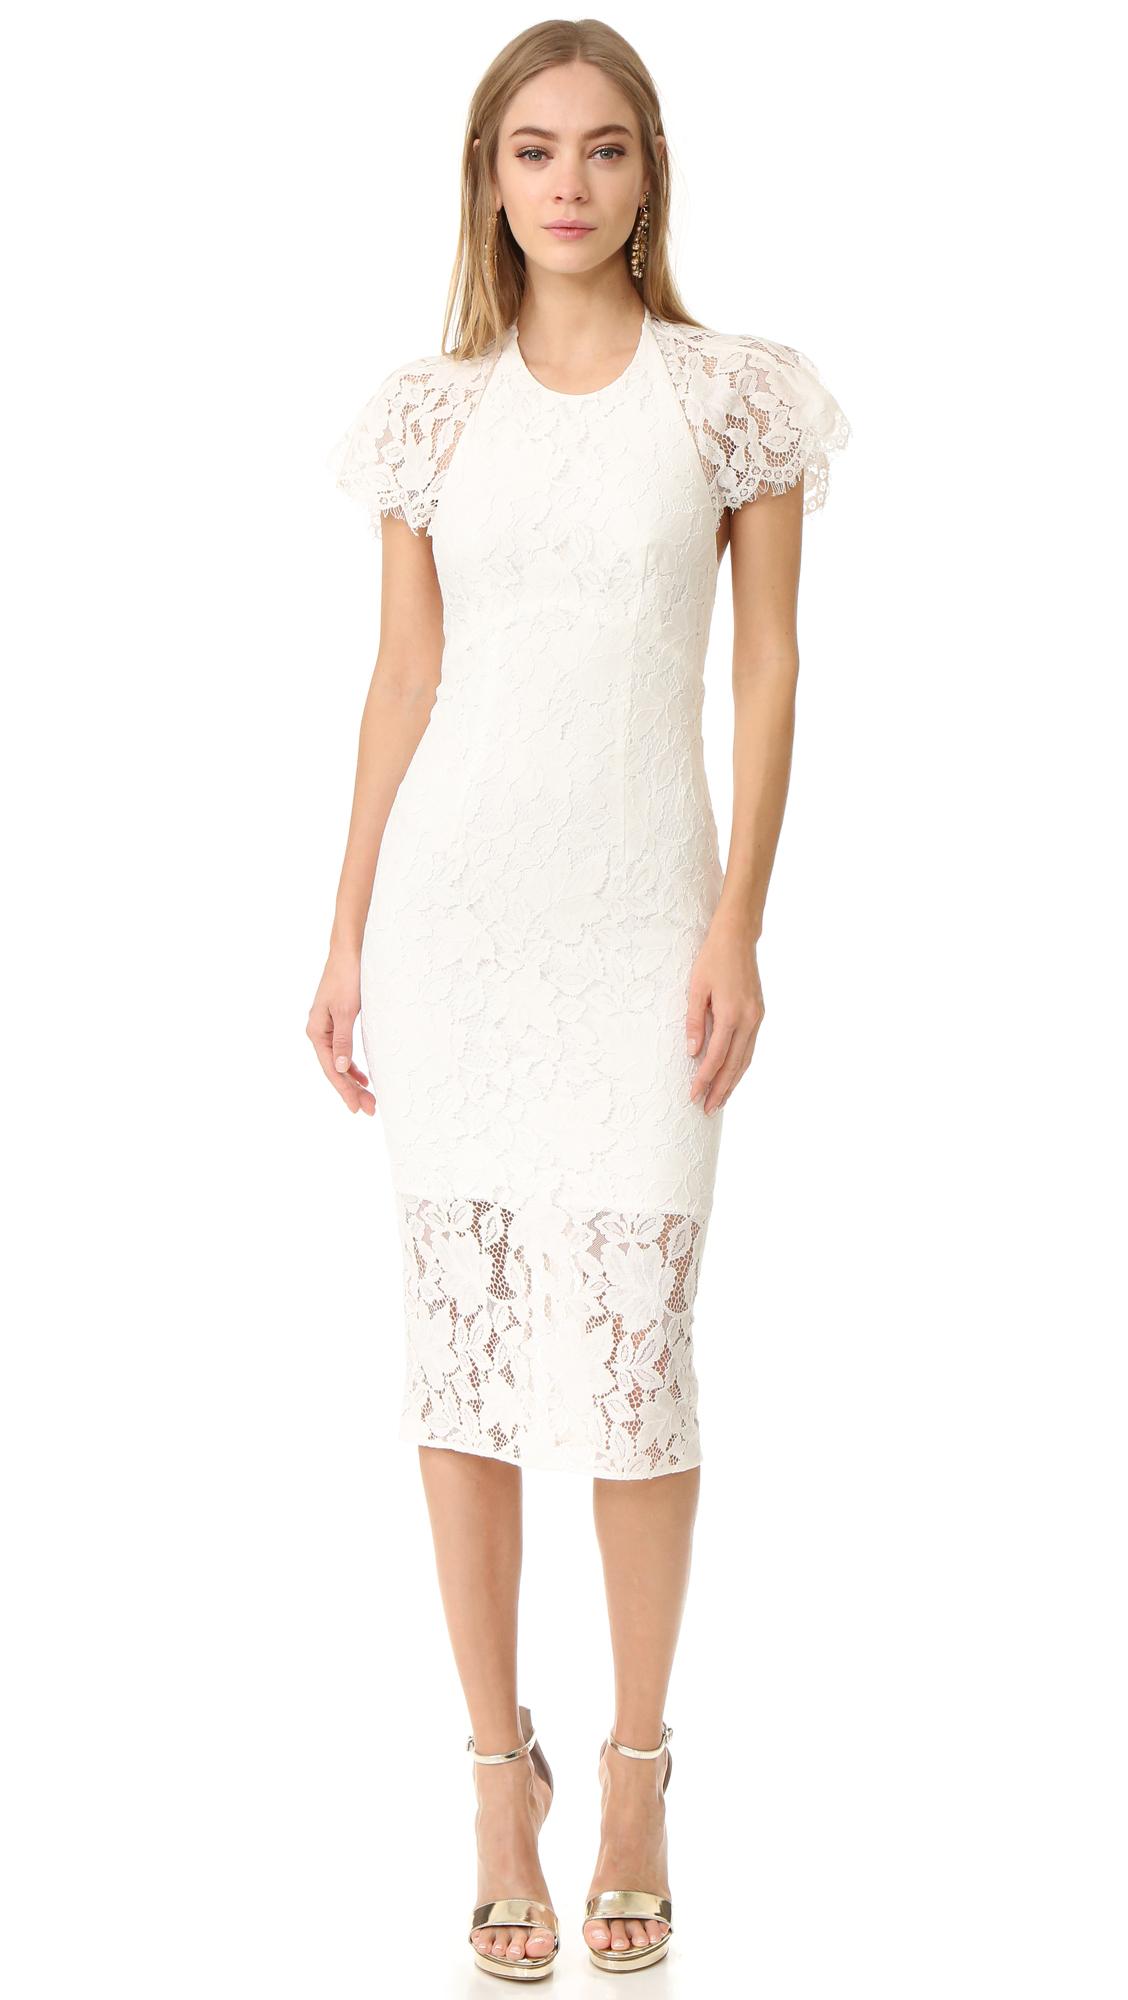 Lover Affinity Midi Dress - White